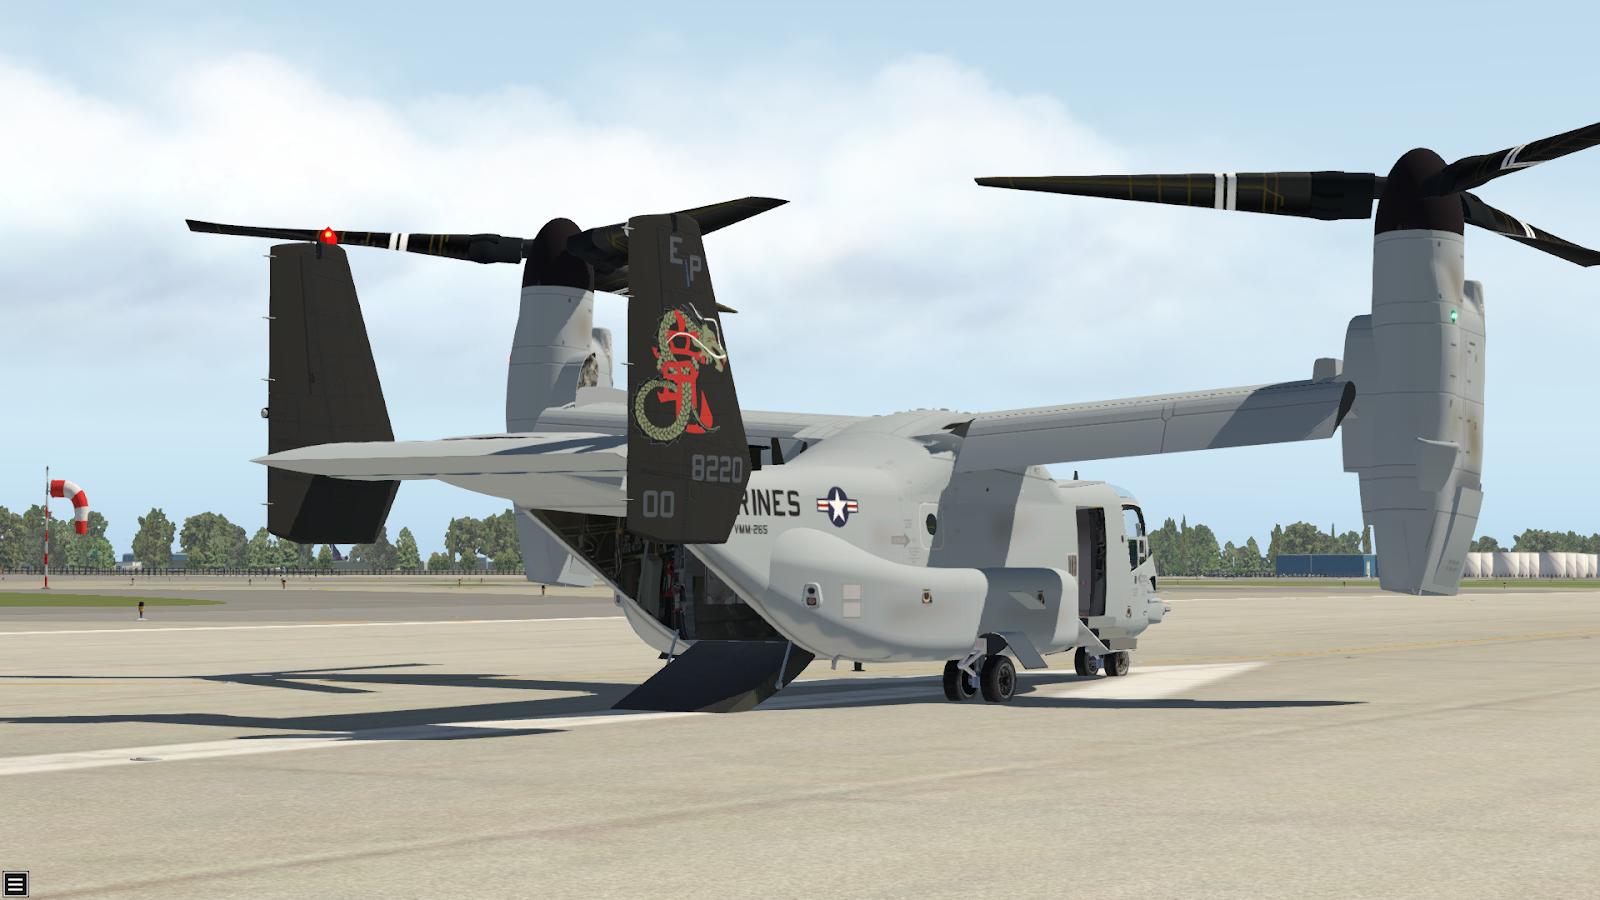 aoa simulations unveiled their new model the v 22 osprey fabrice rh fk xp blogspot com v-22 osprey manual v-22 osprey natops manual